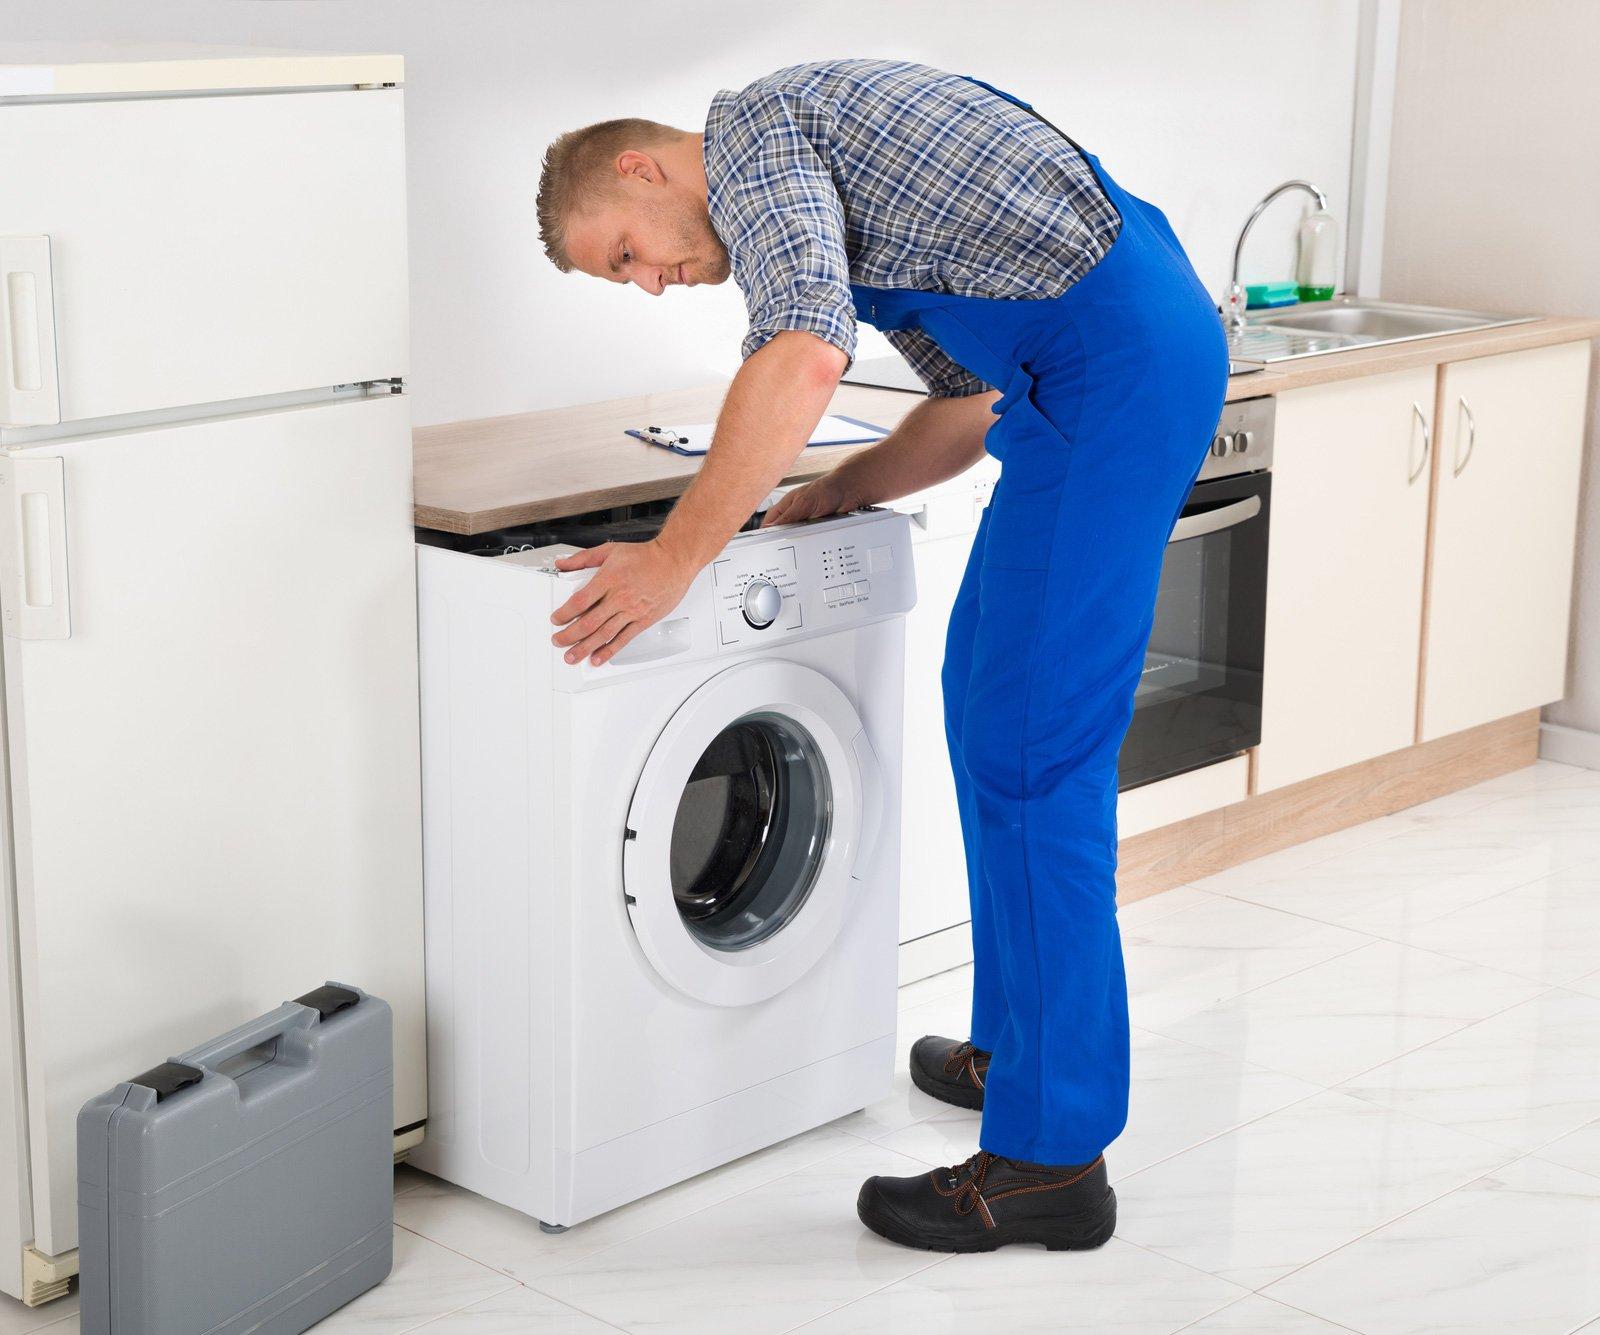 Installer une machine à laver